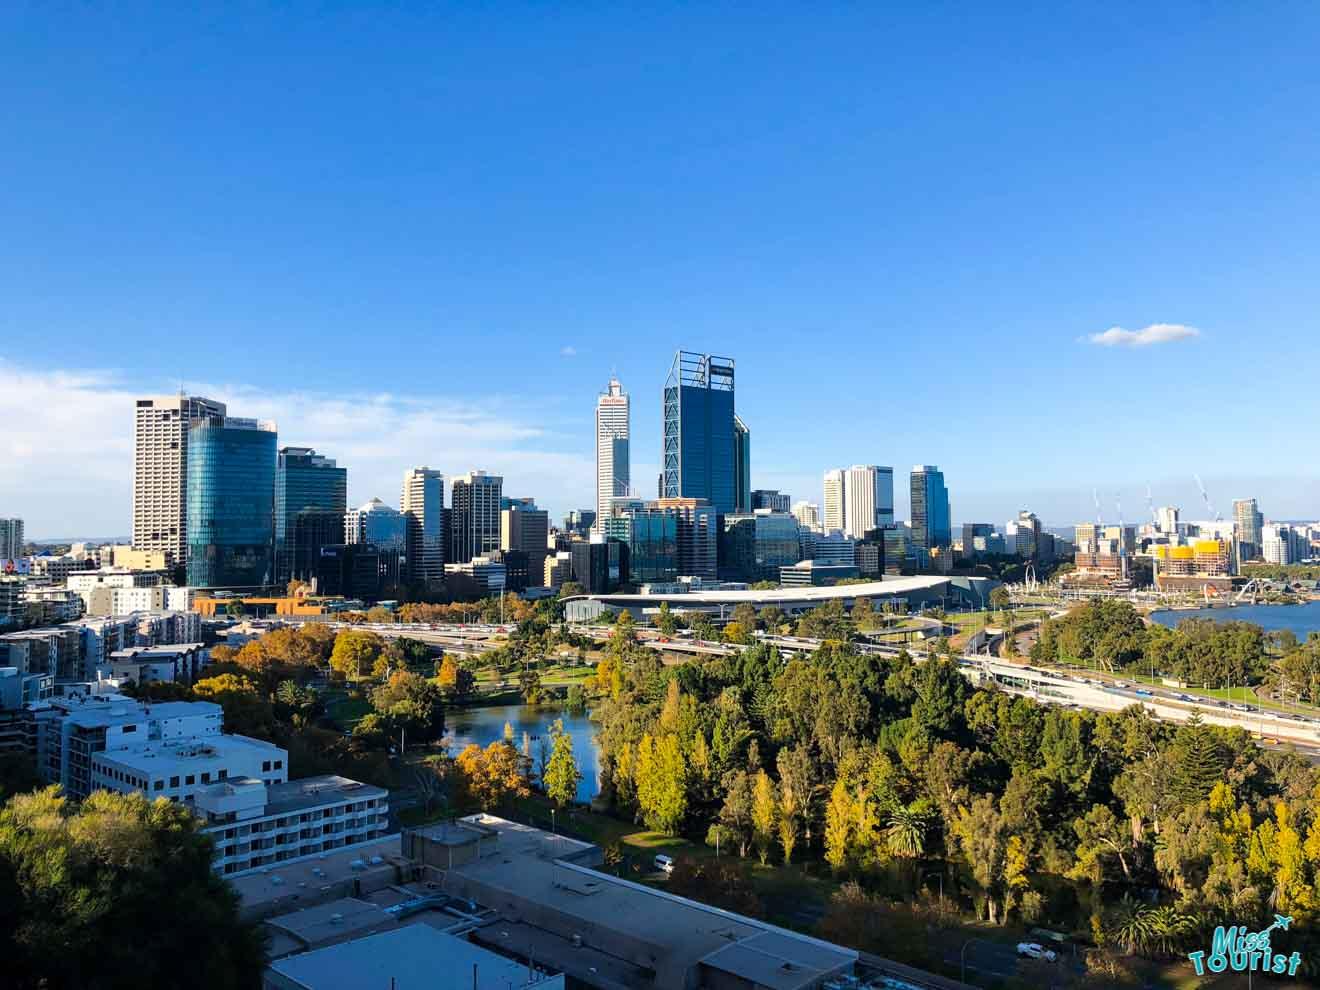 wa road trip planner - Perth Western Australia Road trip